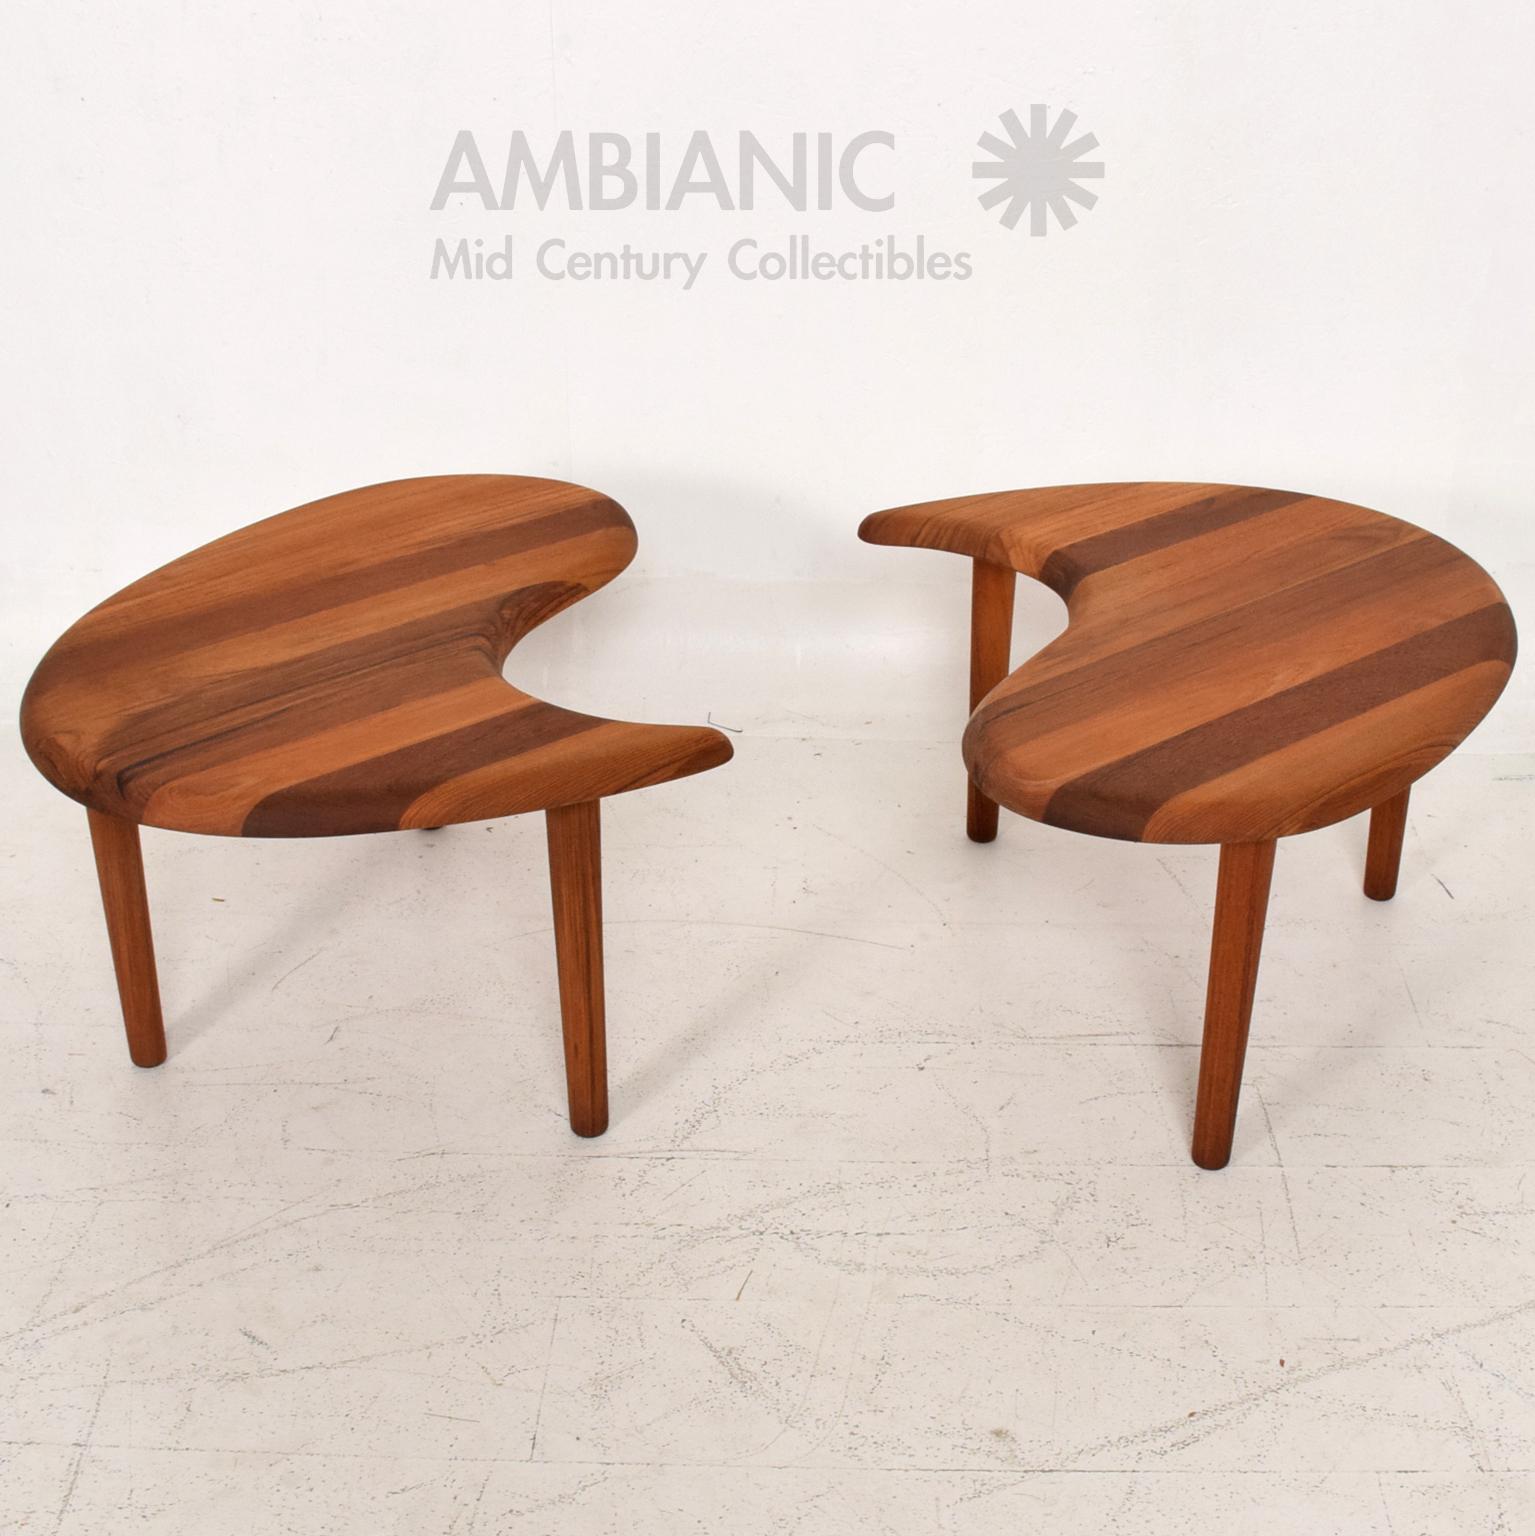 Teak Scandinavian Mid Century Modern Solid Teak Side Tables Coffee Table  For Sale   Image 7